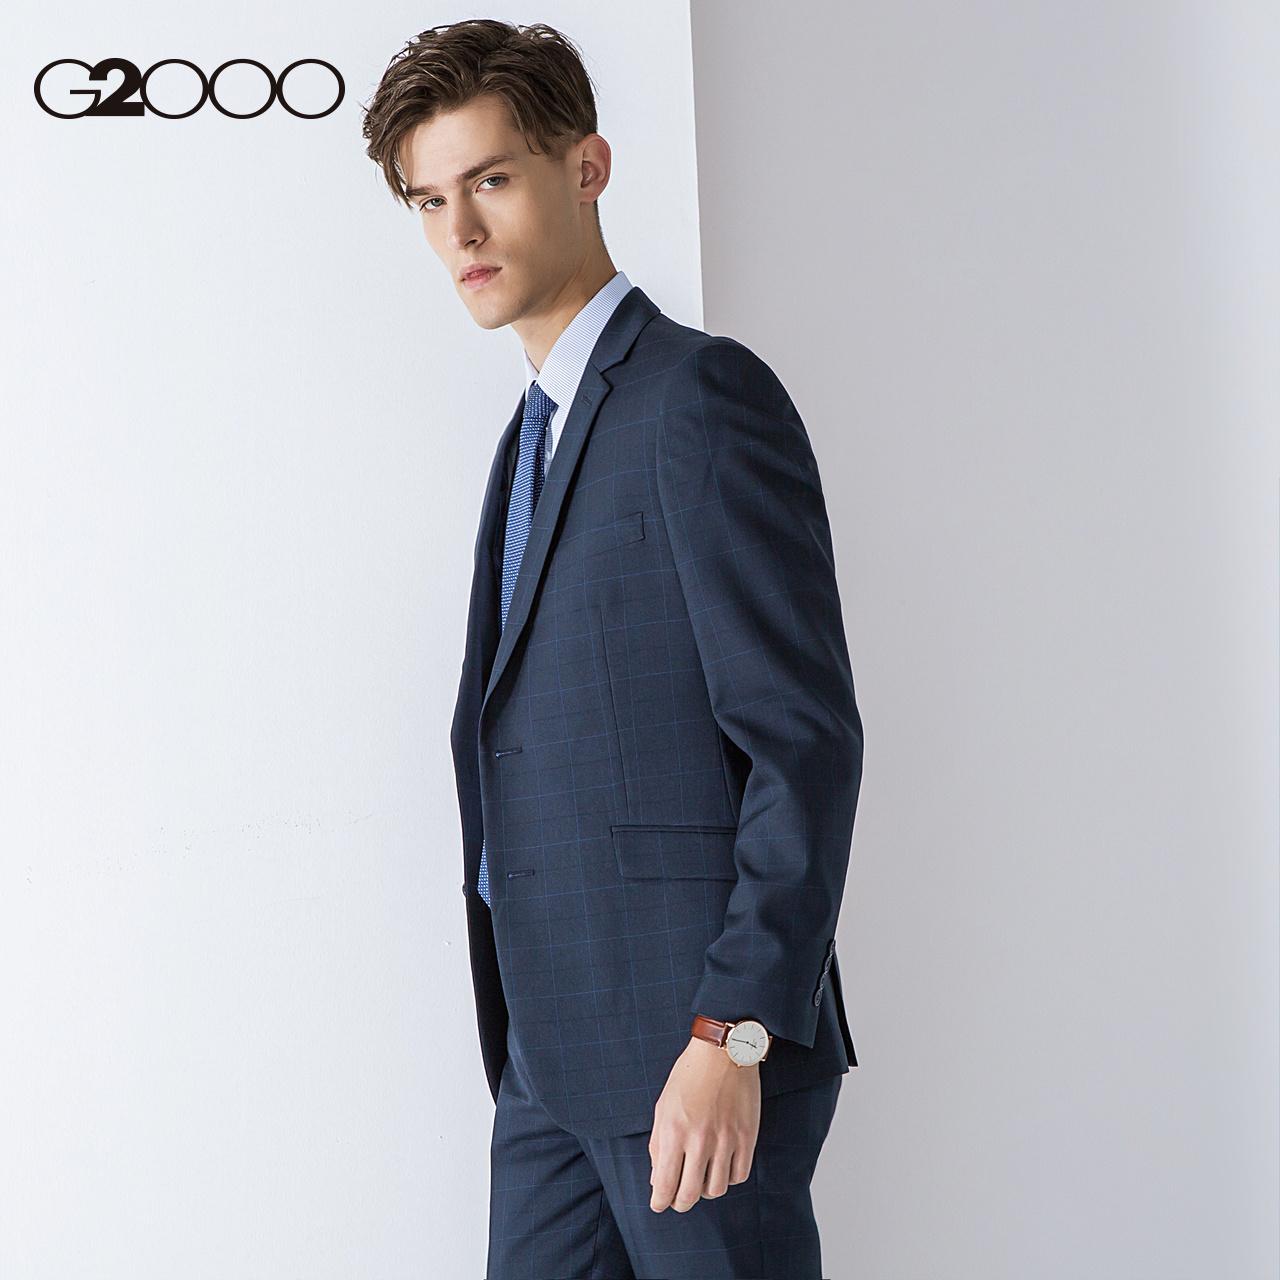 G2000格子休闲西装外套男 2018新款防静电商务修身西服上衣